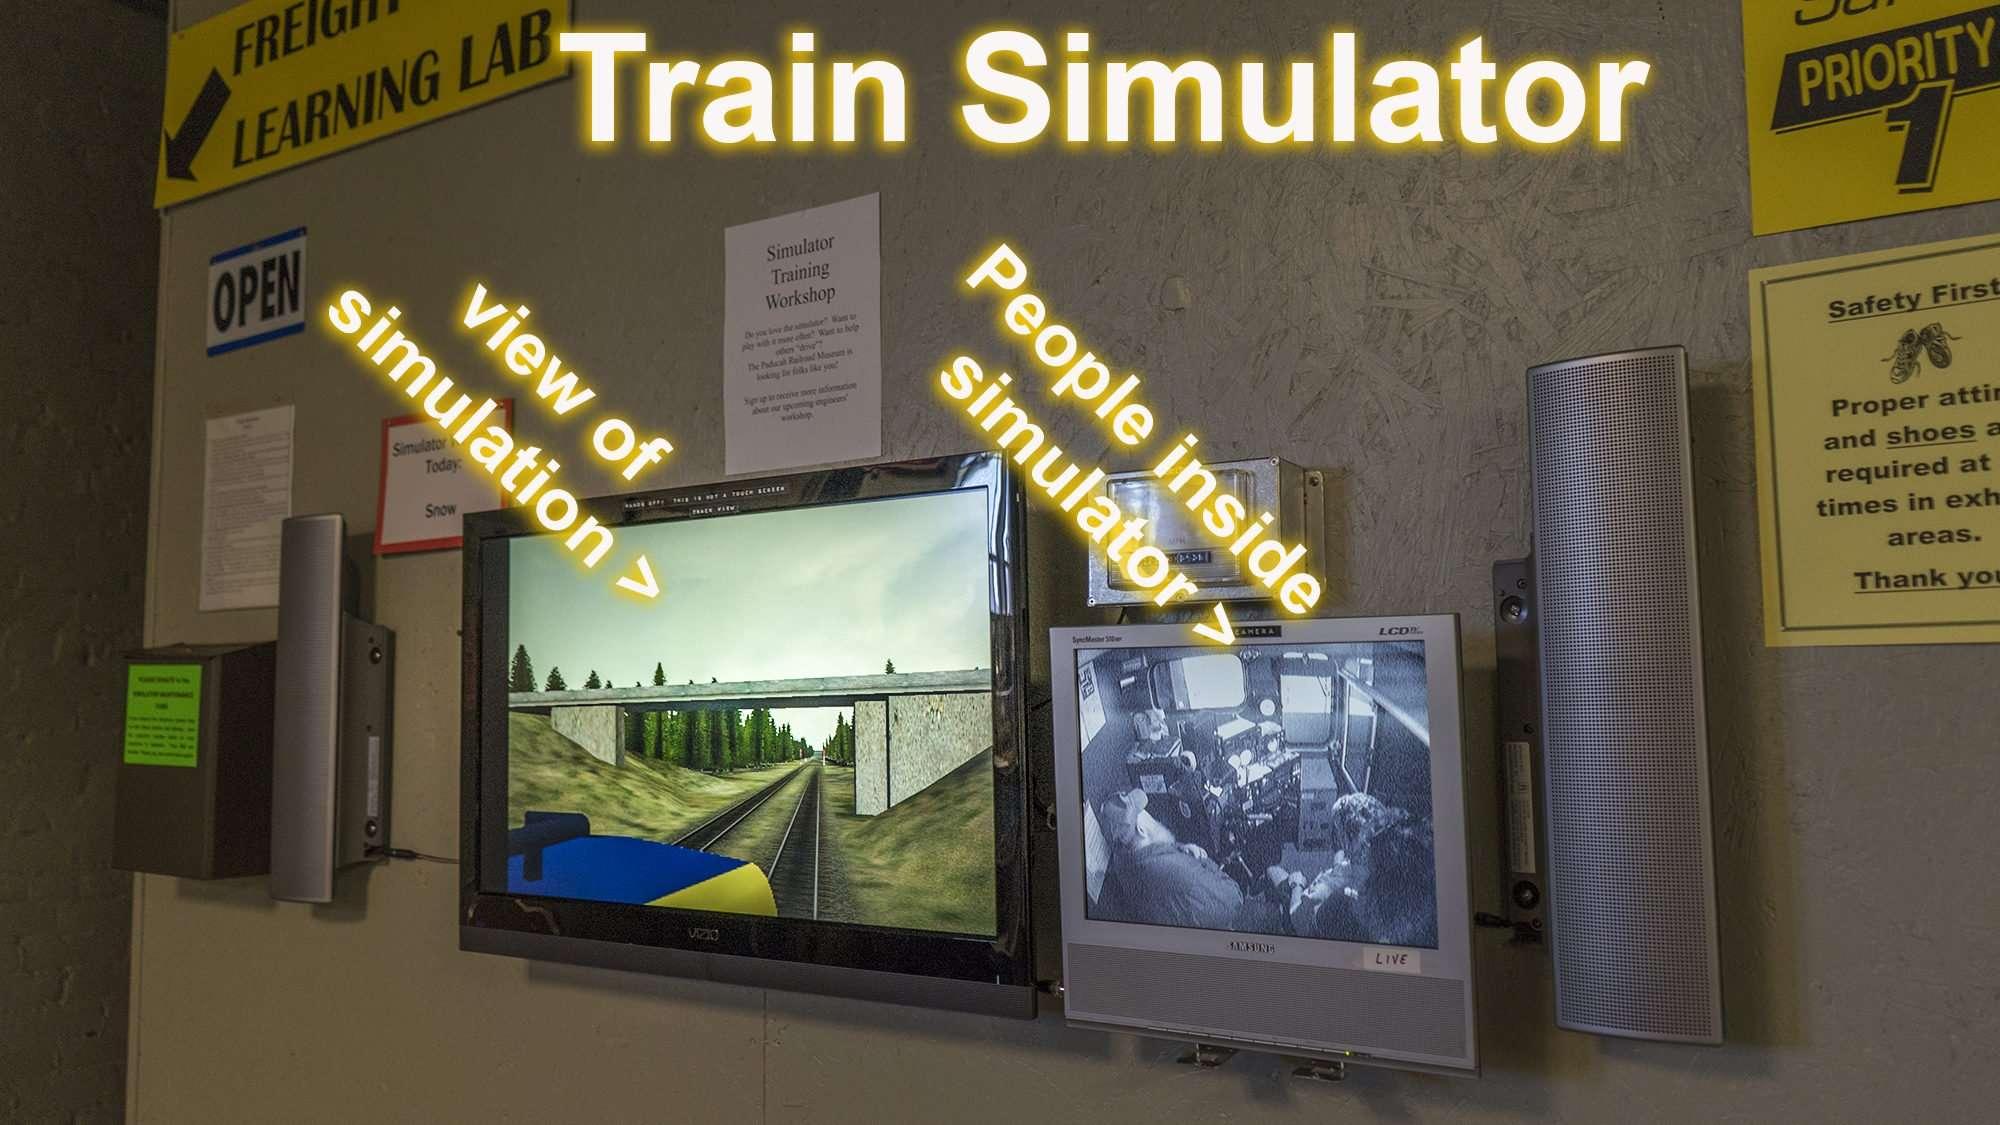 April 6, 2017 - Train Simulator Paducah Railroad Museum/photonews247.com